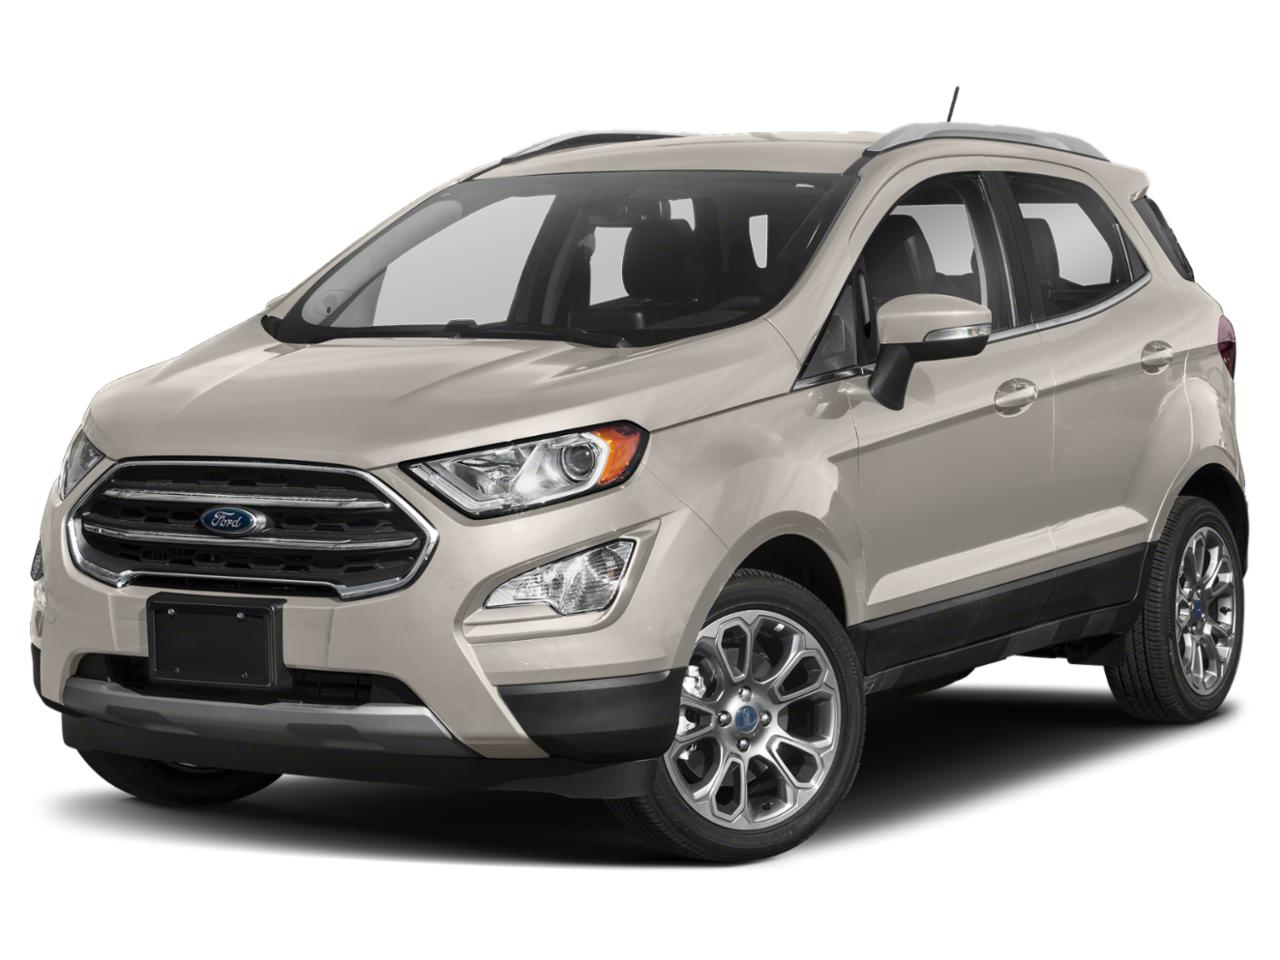 Moondust Silver Metallic 2020 Ford EcoSport SE AWD SE 4dr Crossover New Bern NC